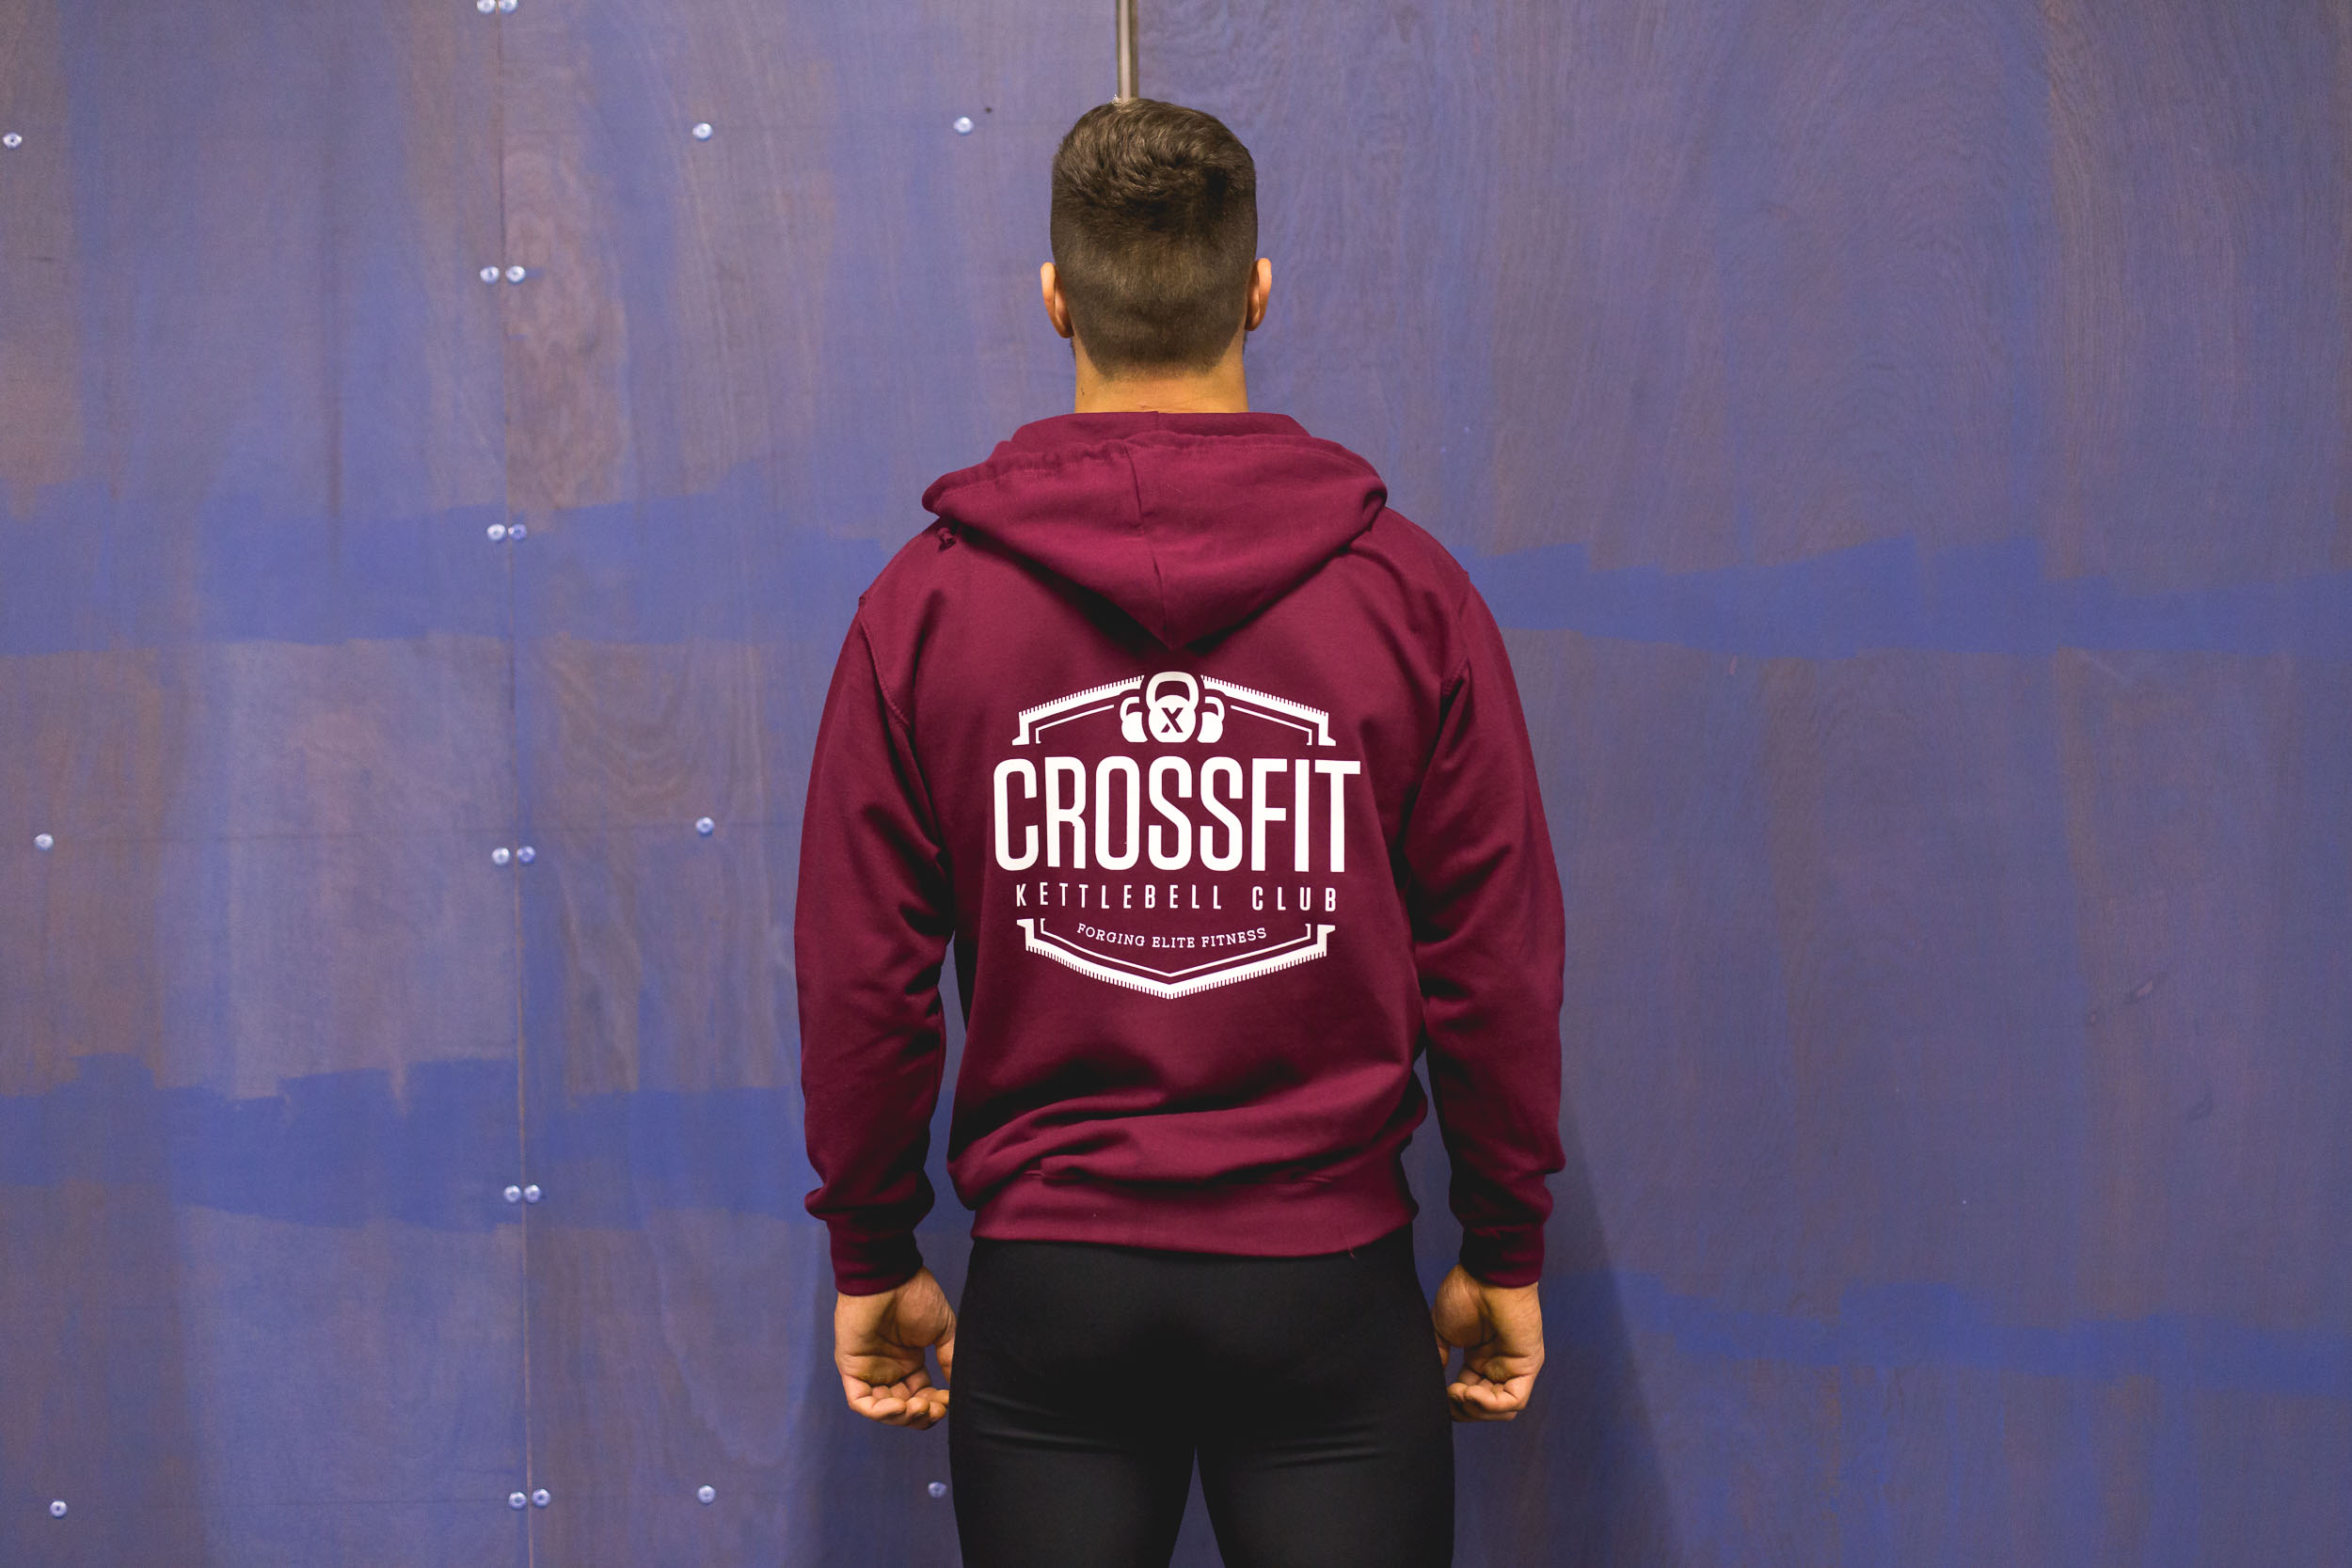 Crossfit UK printed clothing t-shirts-9705.jpg